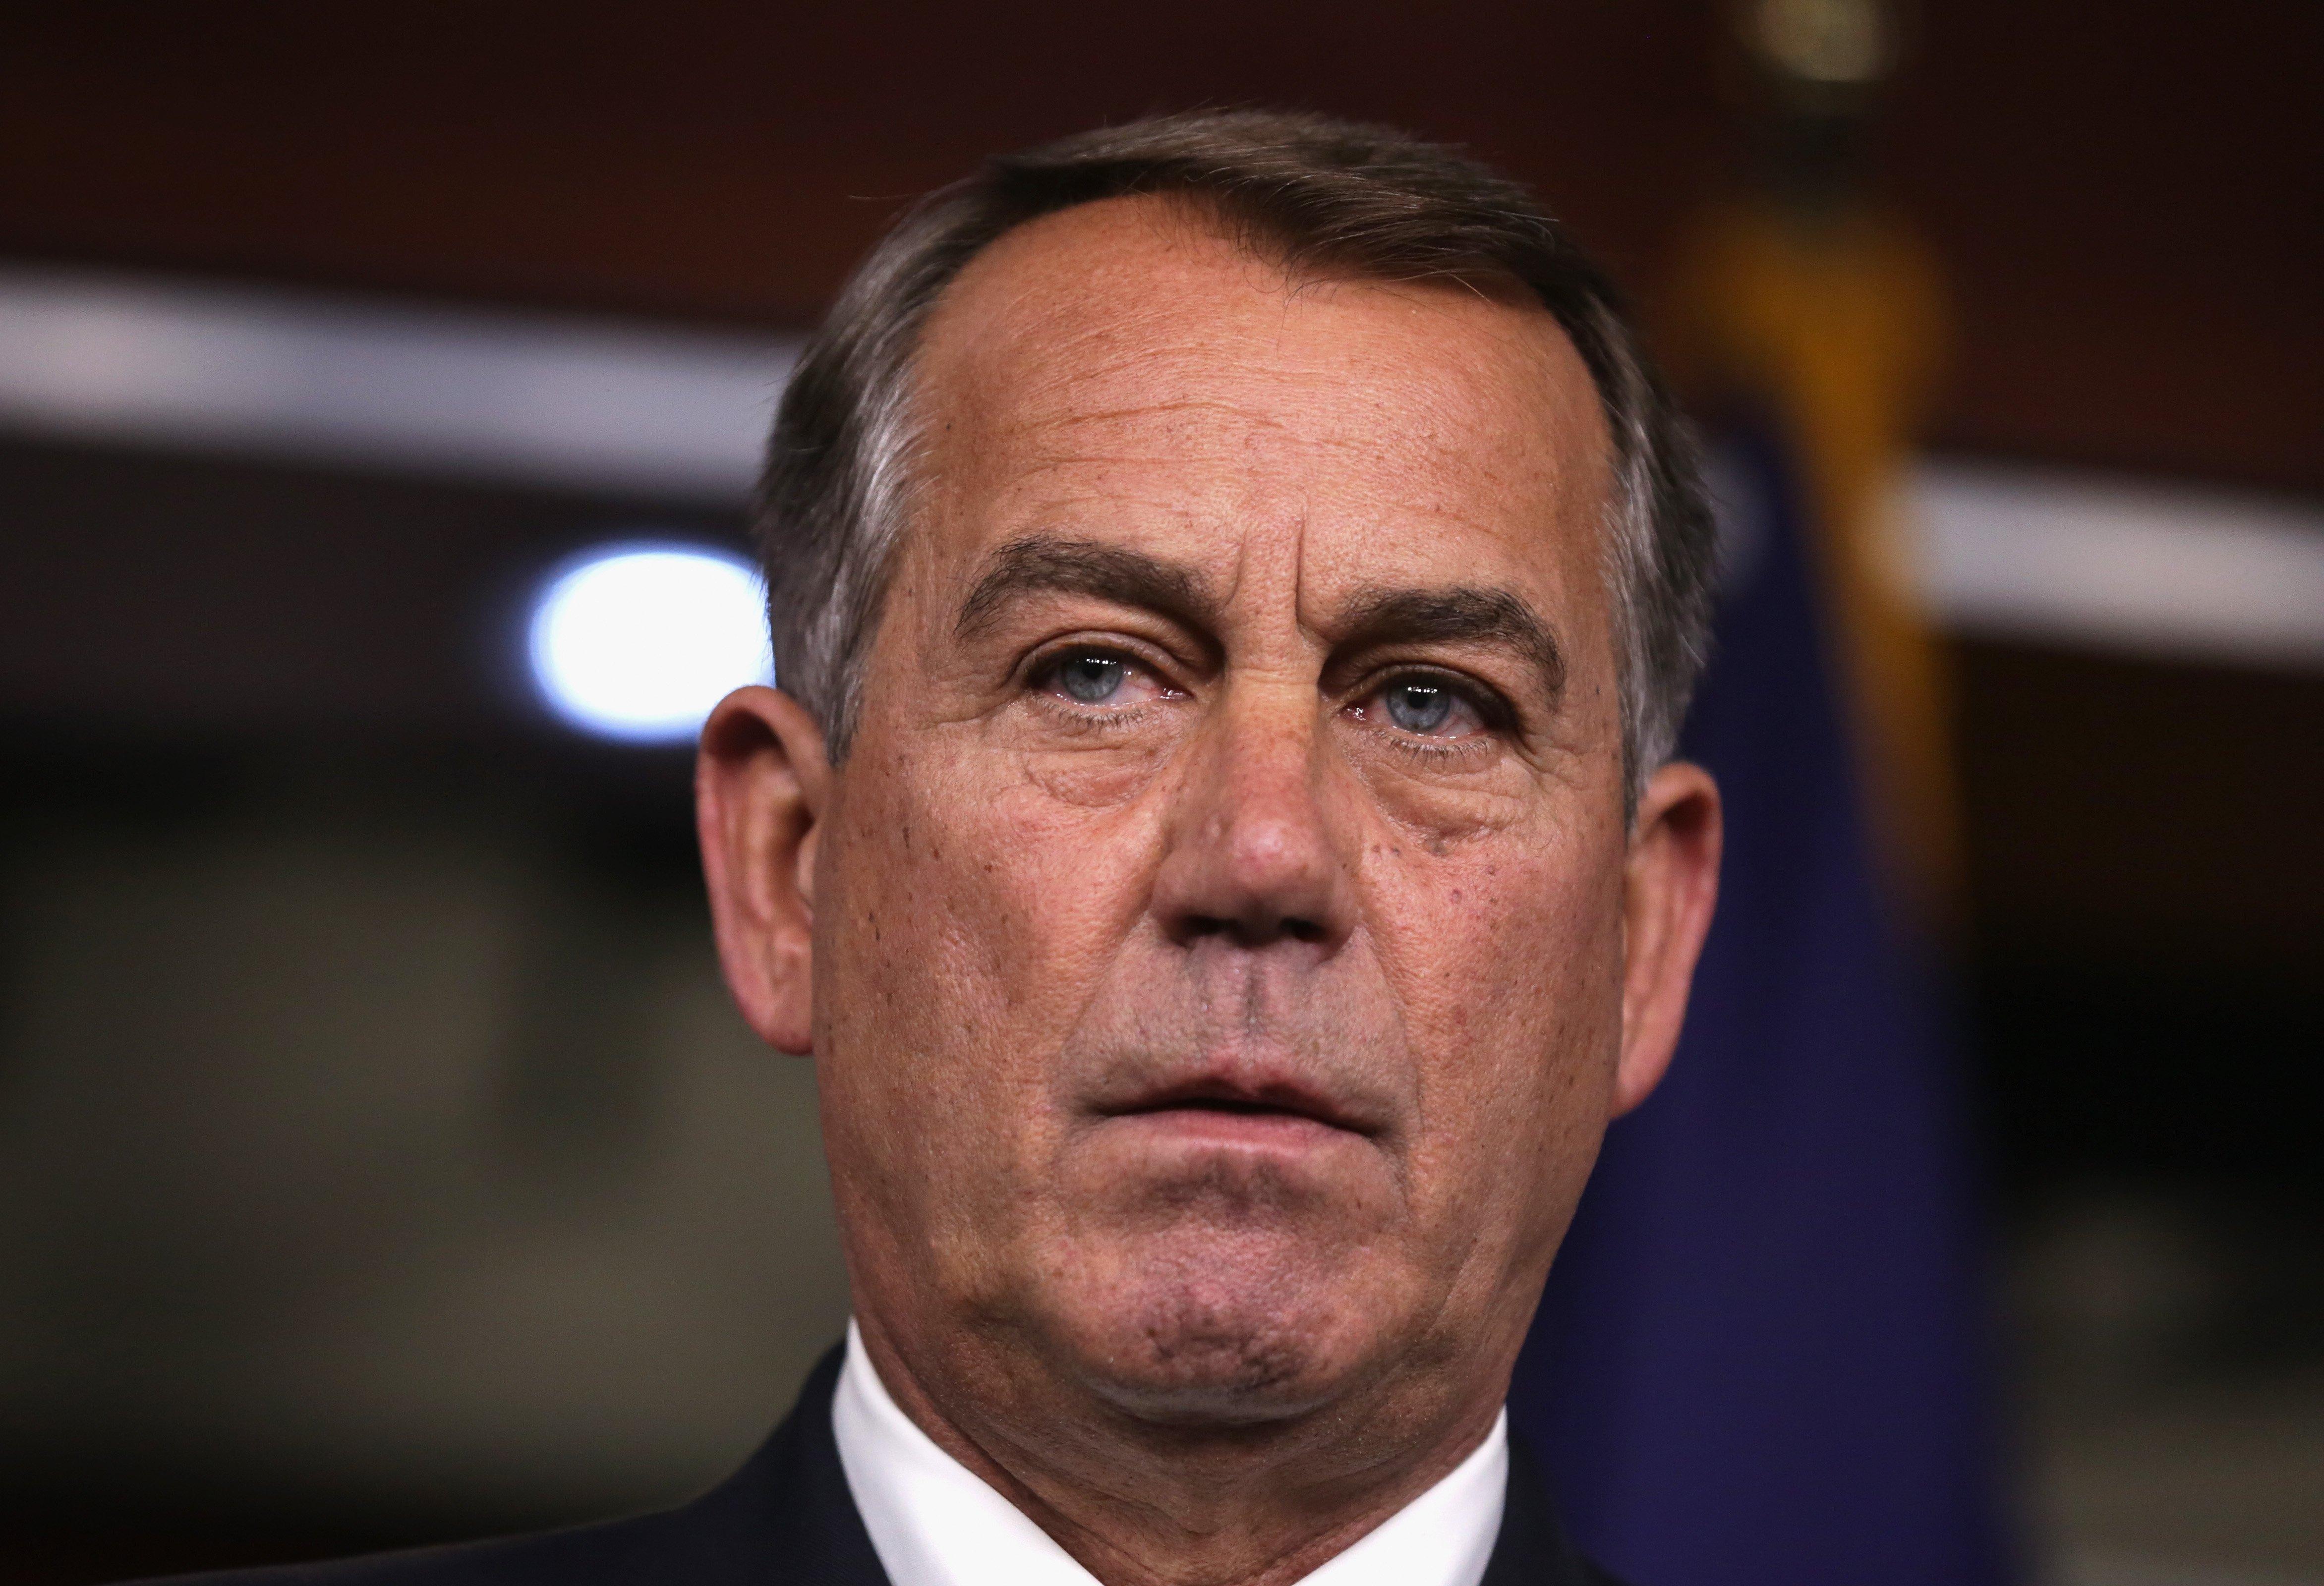 U.S. Speaker of the House Rep. John Boehner speaks during a news conference on June 12, 2014 in Washington.